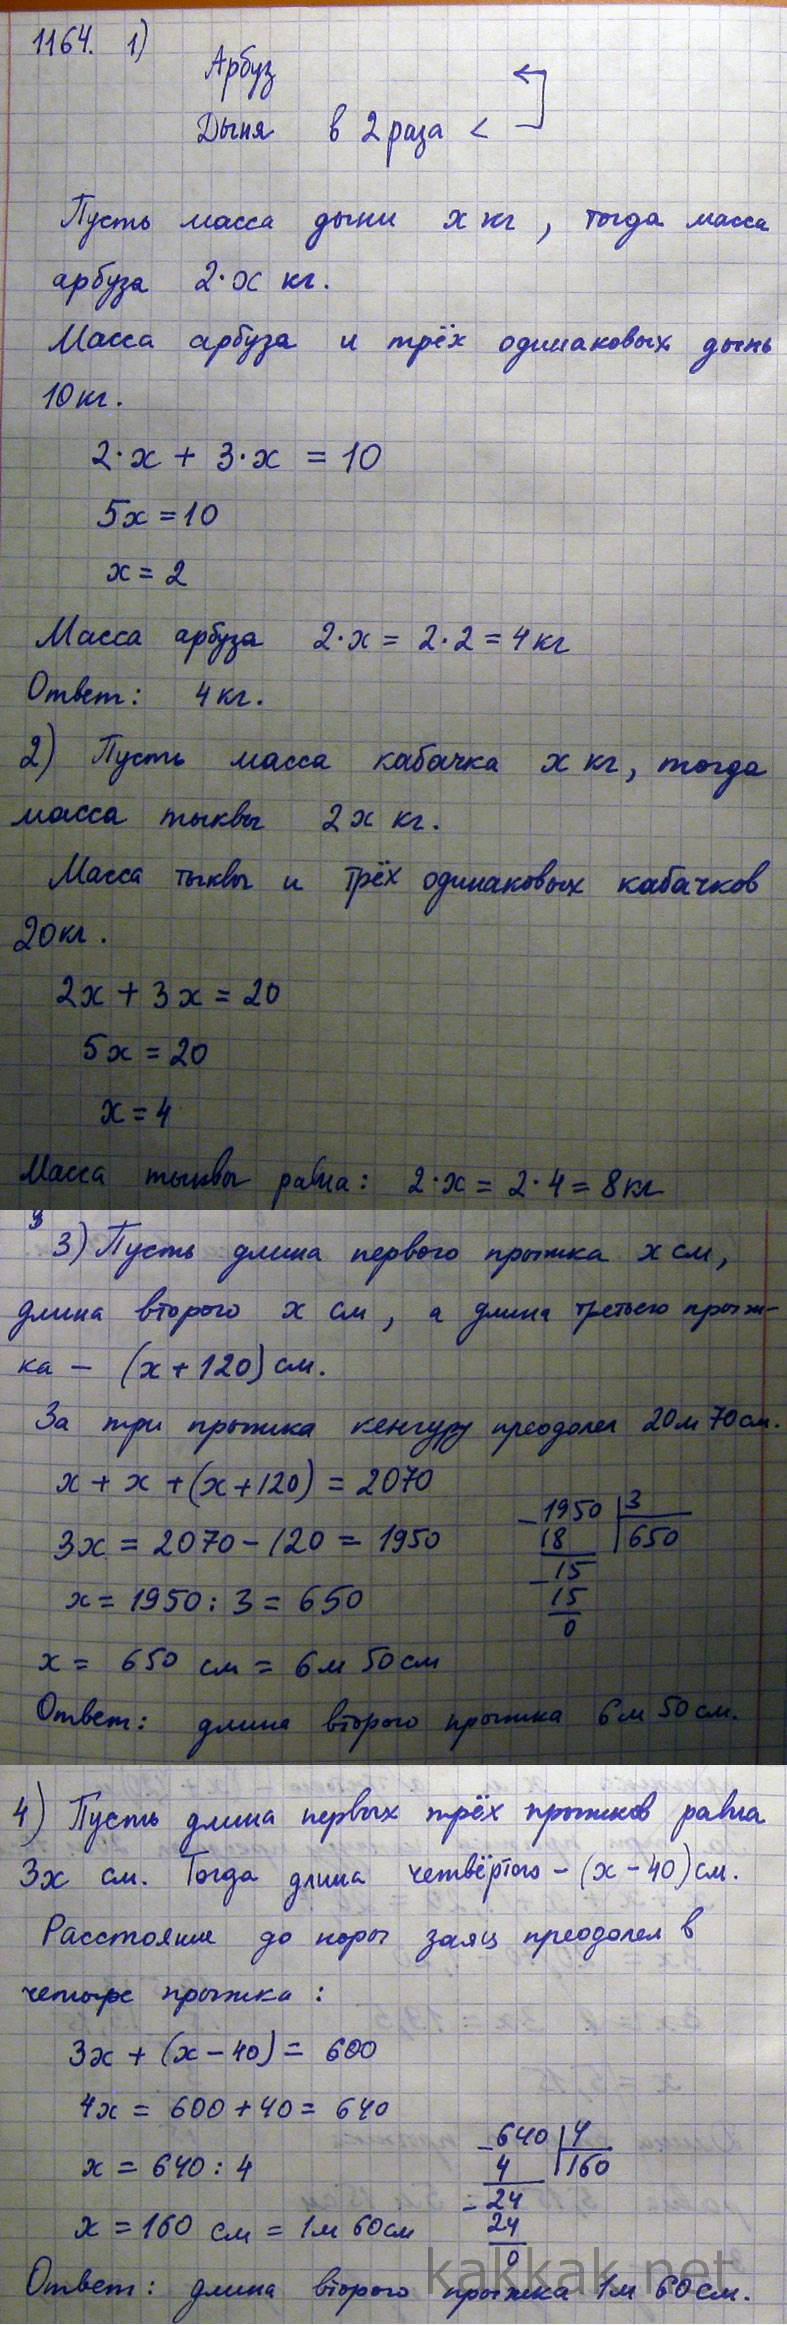 решебник по математике 5 класс номер 1164